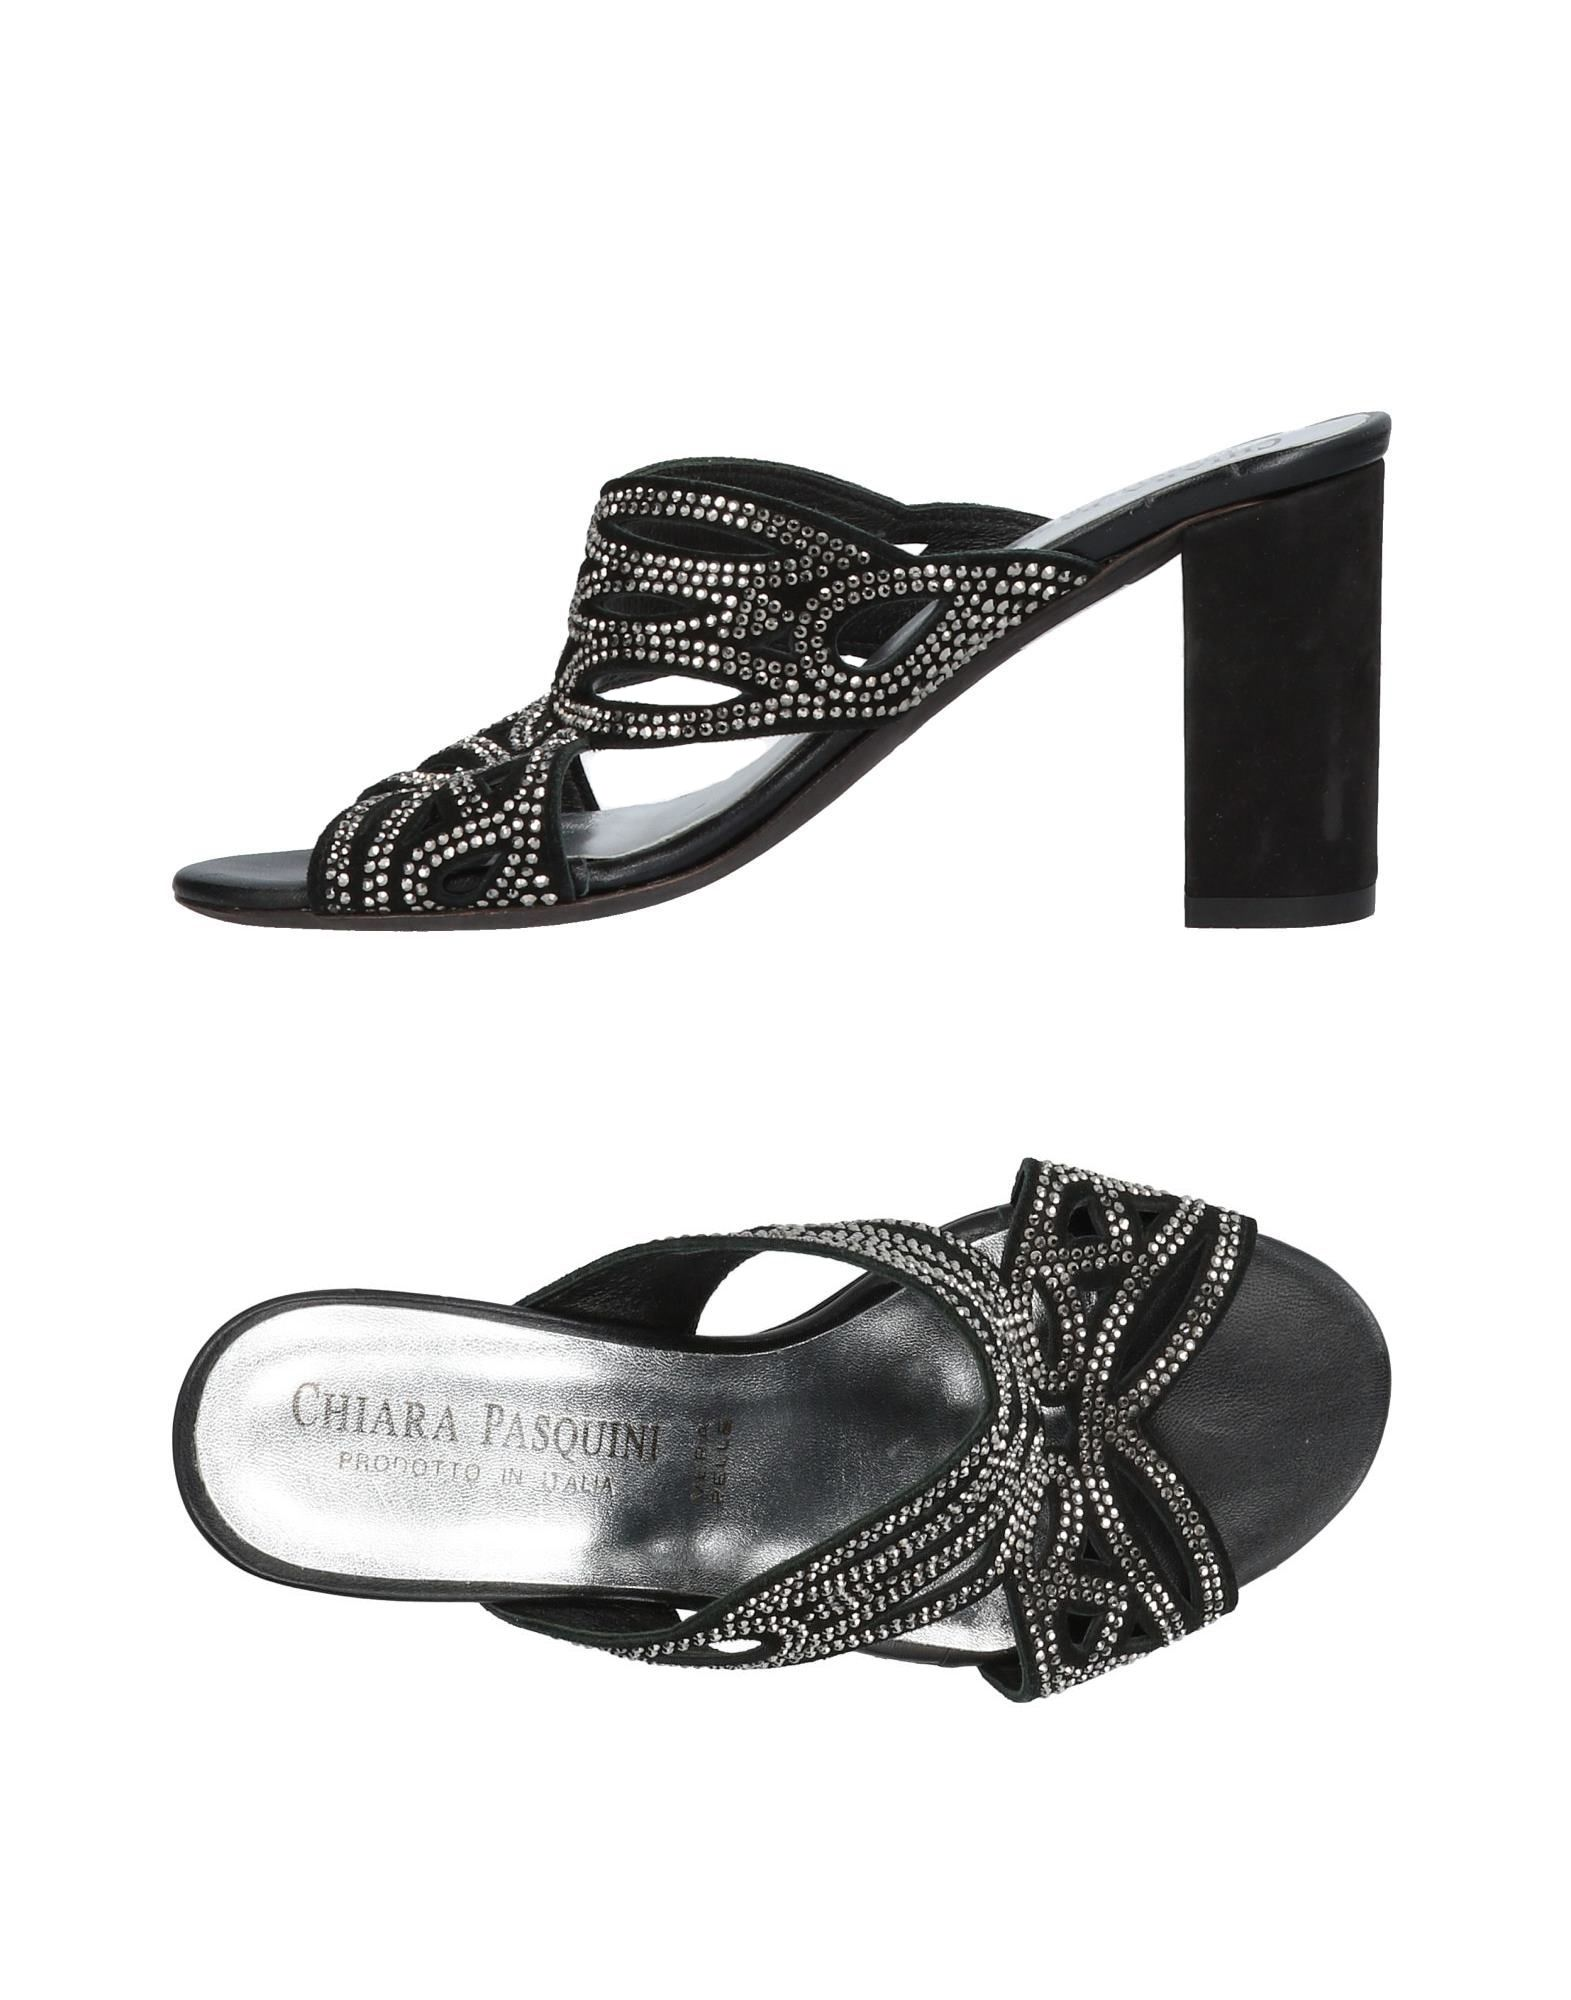 Chiara Pasquini Sandalen Damen  11424846MR Gute Qualität beliebte Schuhe